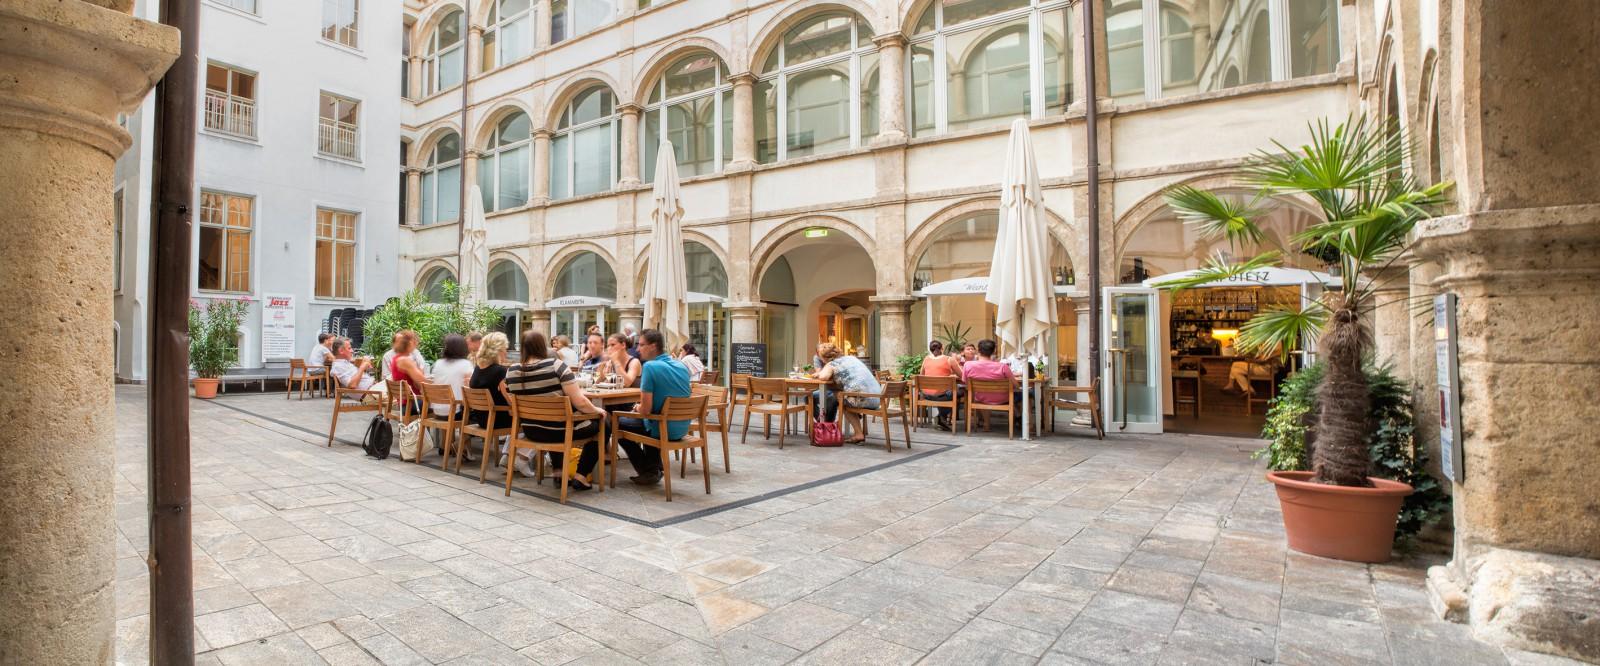 Restaurant Klapotetz Weinbar in Graz